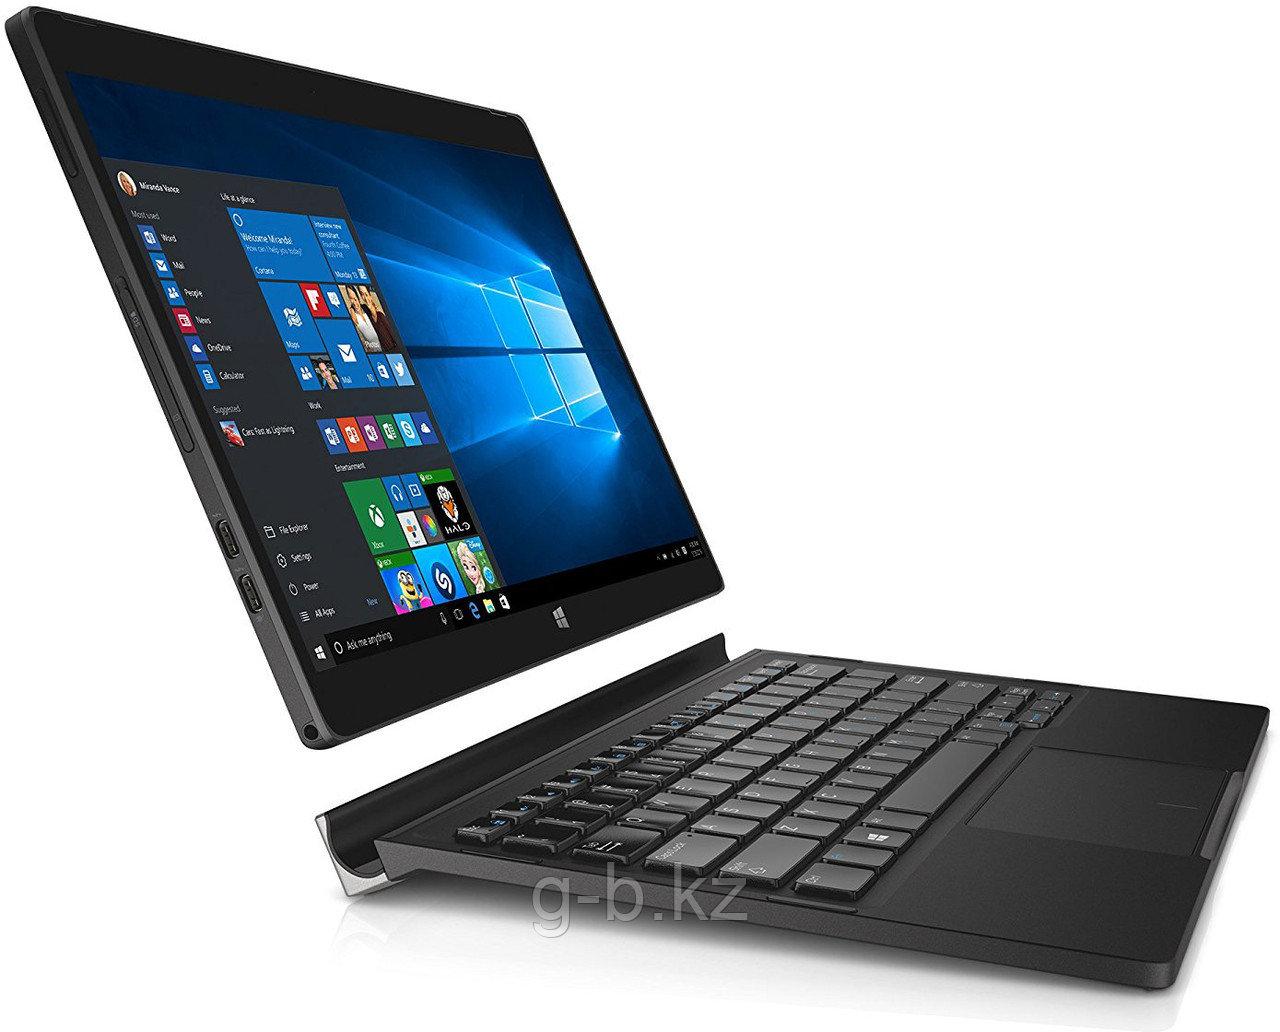 Ноутбук Dell 12,5 ''/Latitude 7275 /Intel  Core M  m5-6Y57 1,1 GHz